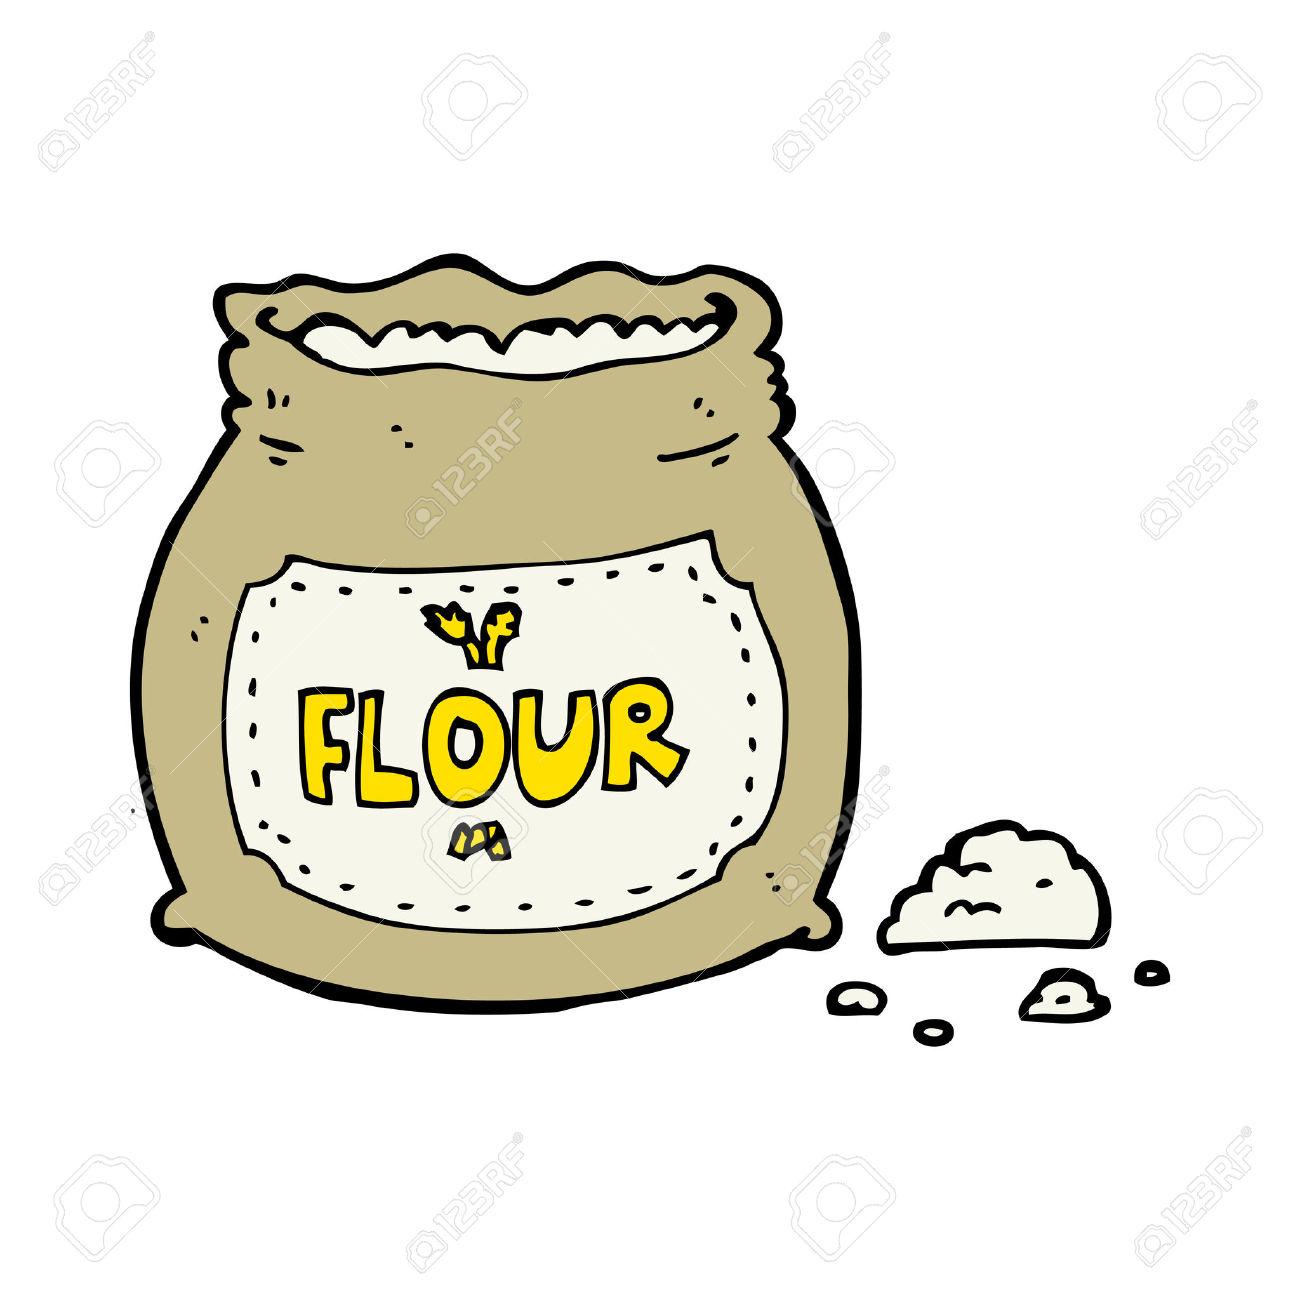 png free stock Flour clipart.  clip art clipartlook.